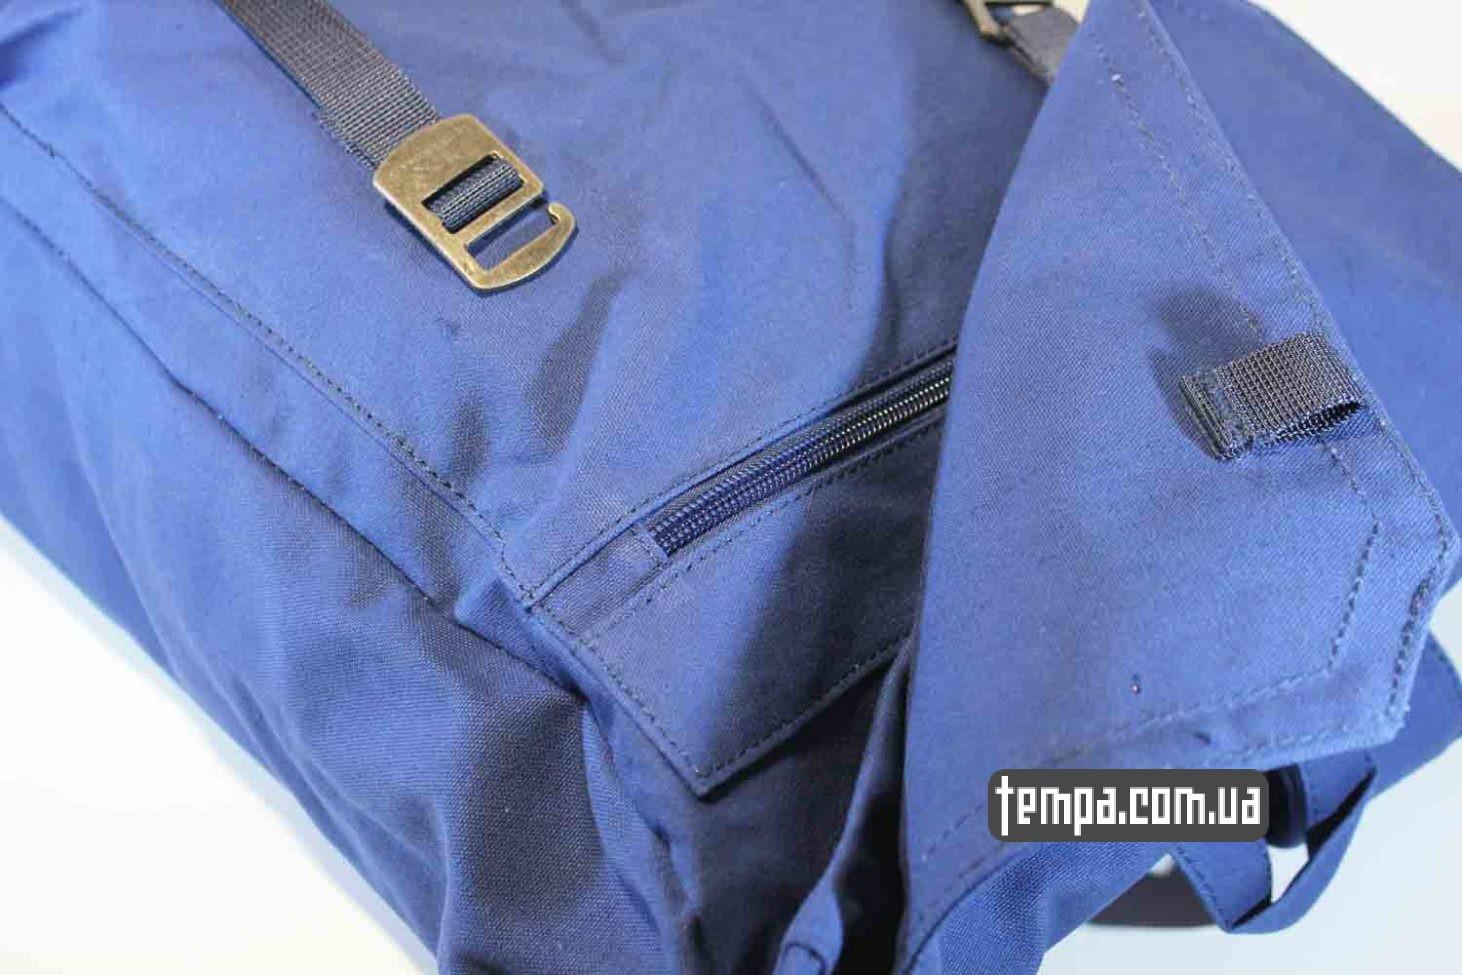 темно-синий оригинальный синий рюкзак сумка Fjallraven Foldsack No.1 Backpack